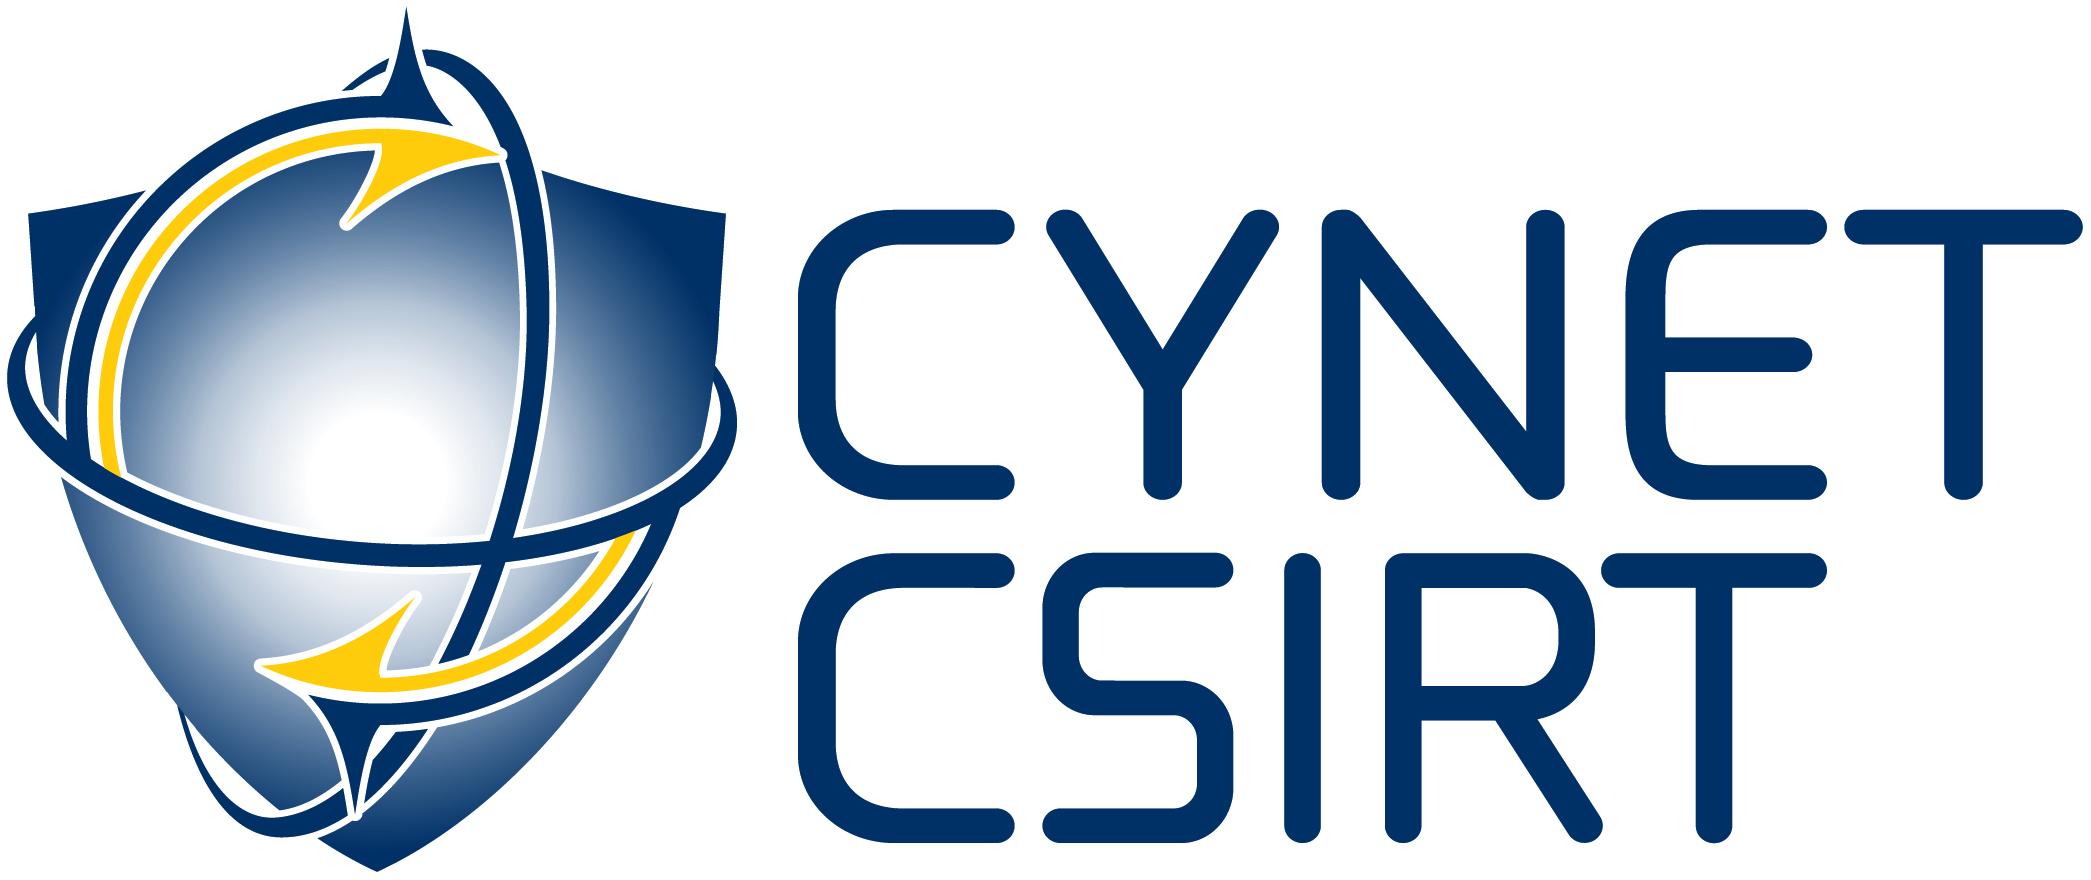 CYNET-CSIRT Logo